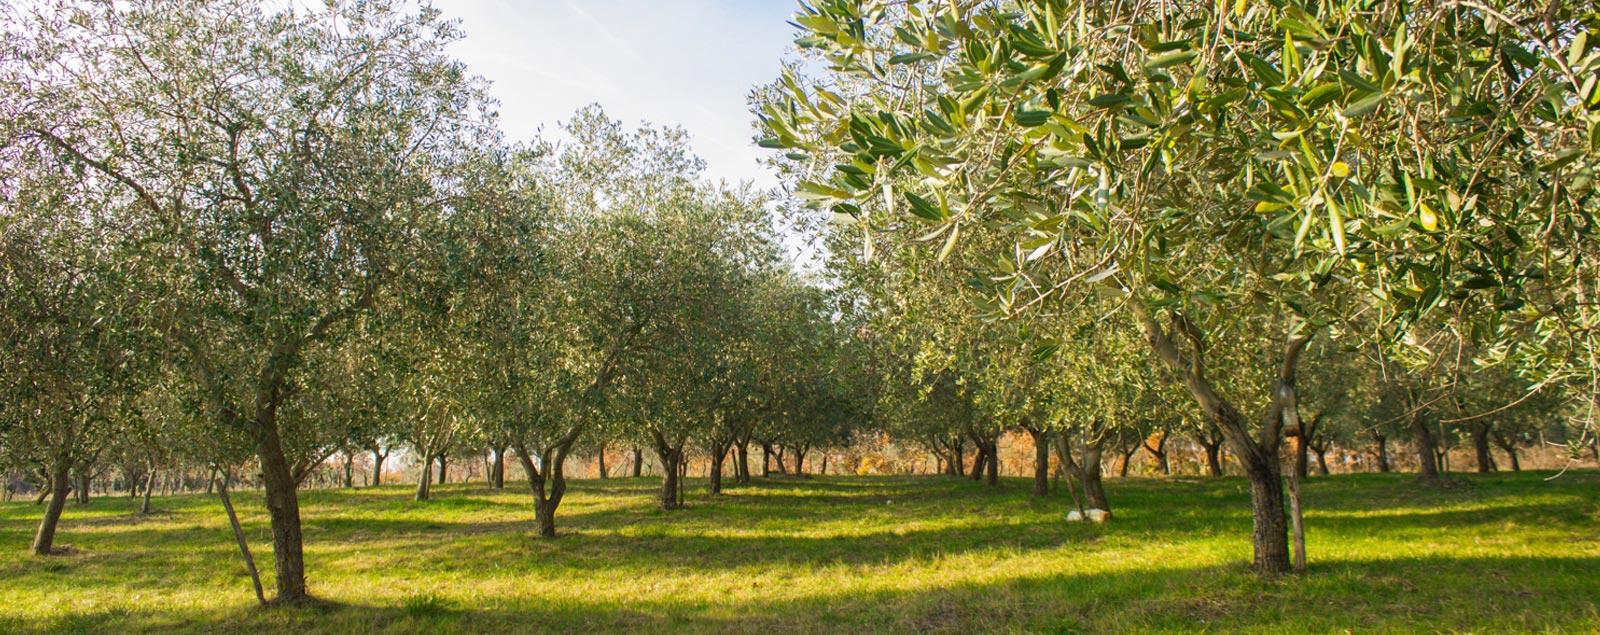 oliveto istriano